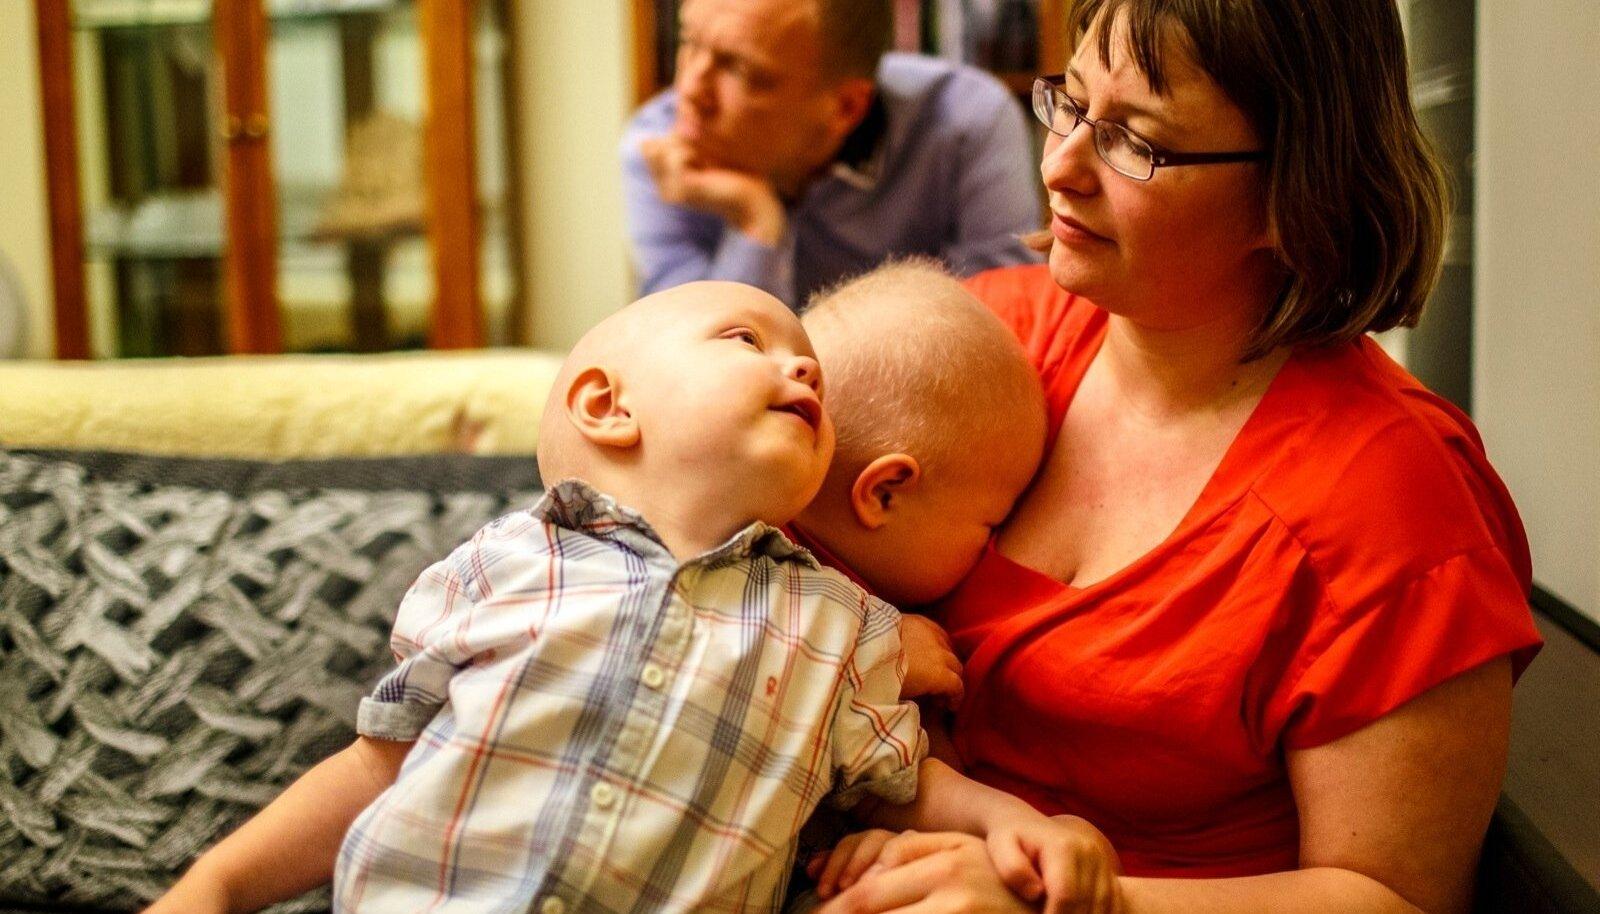 Leukeemiahaiged lapsed peres